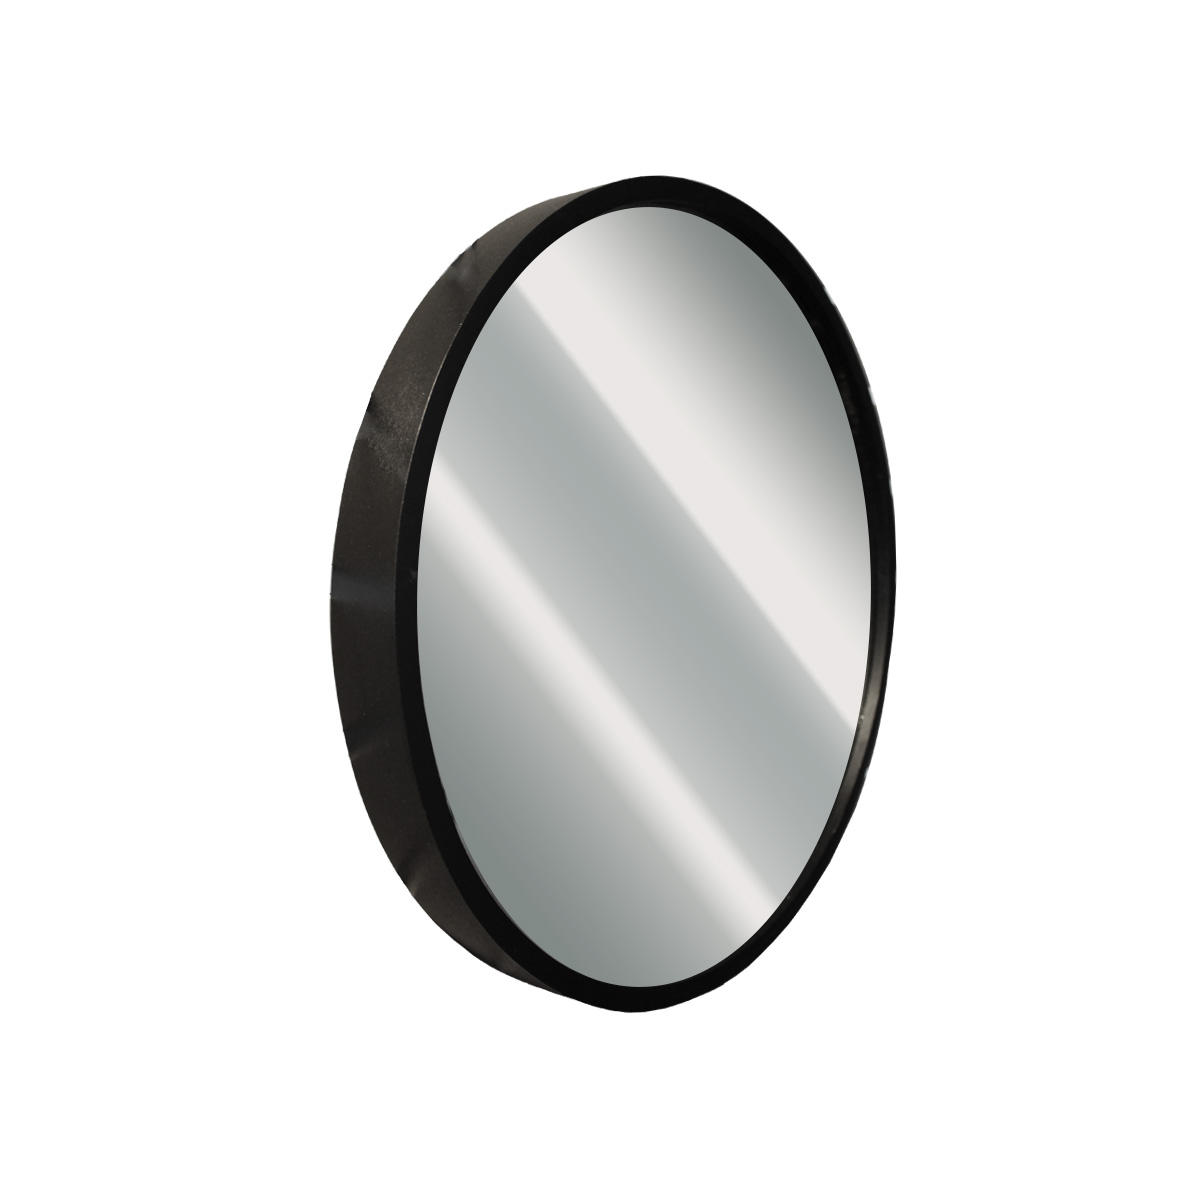 Ogledalo crno MUS -198